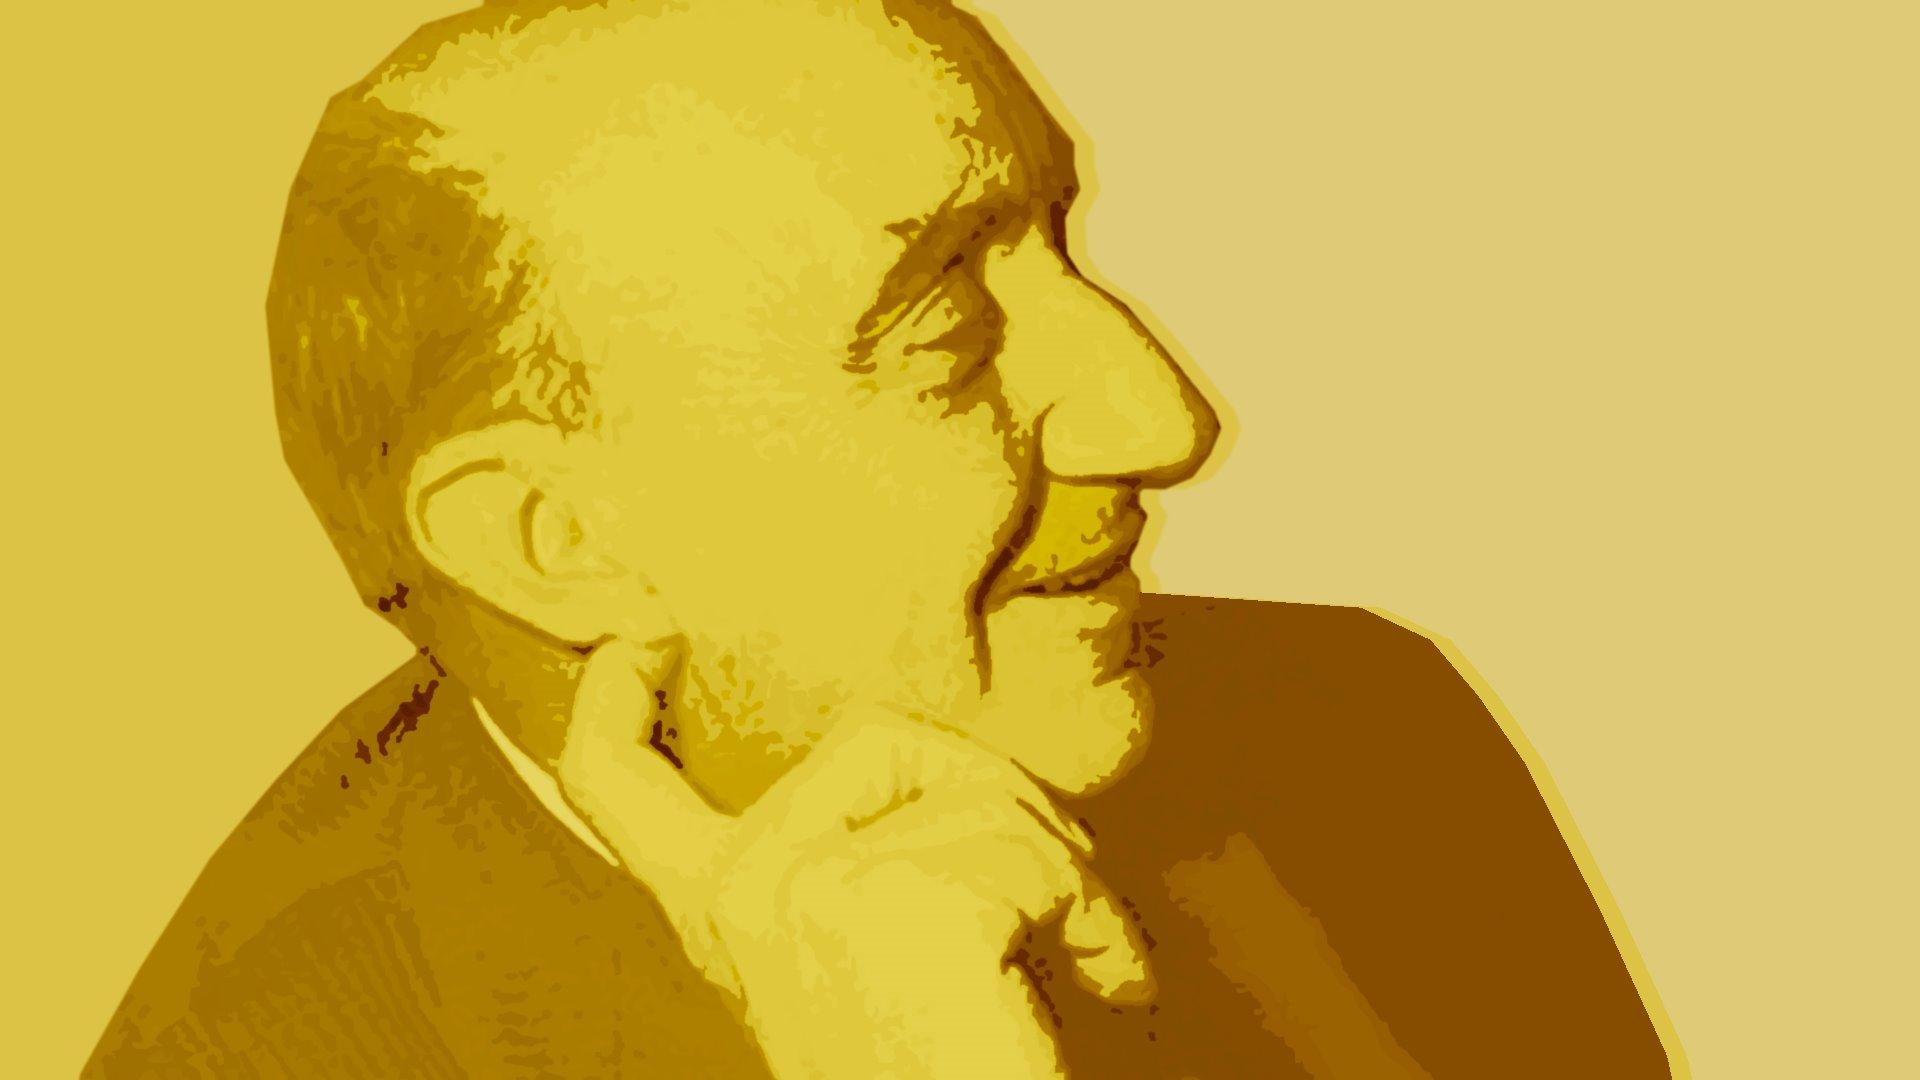 Awarding of the Montaigne Prize 1982 toJosé María Soler